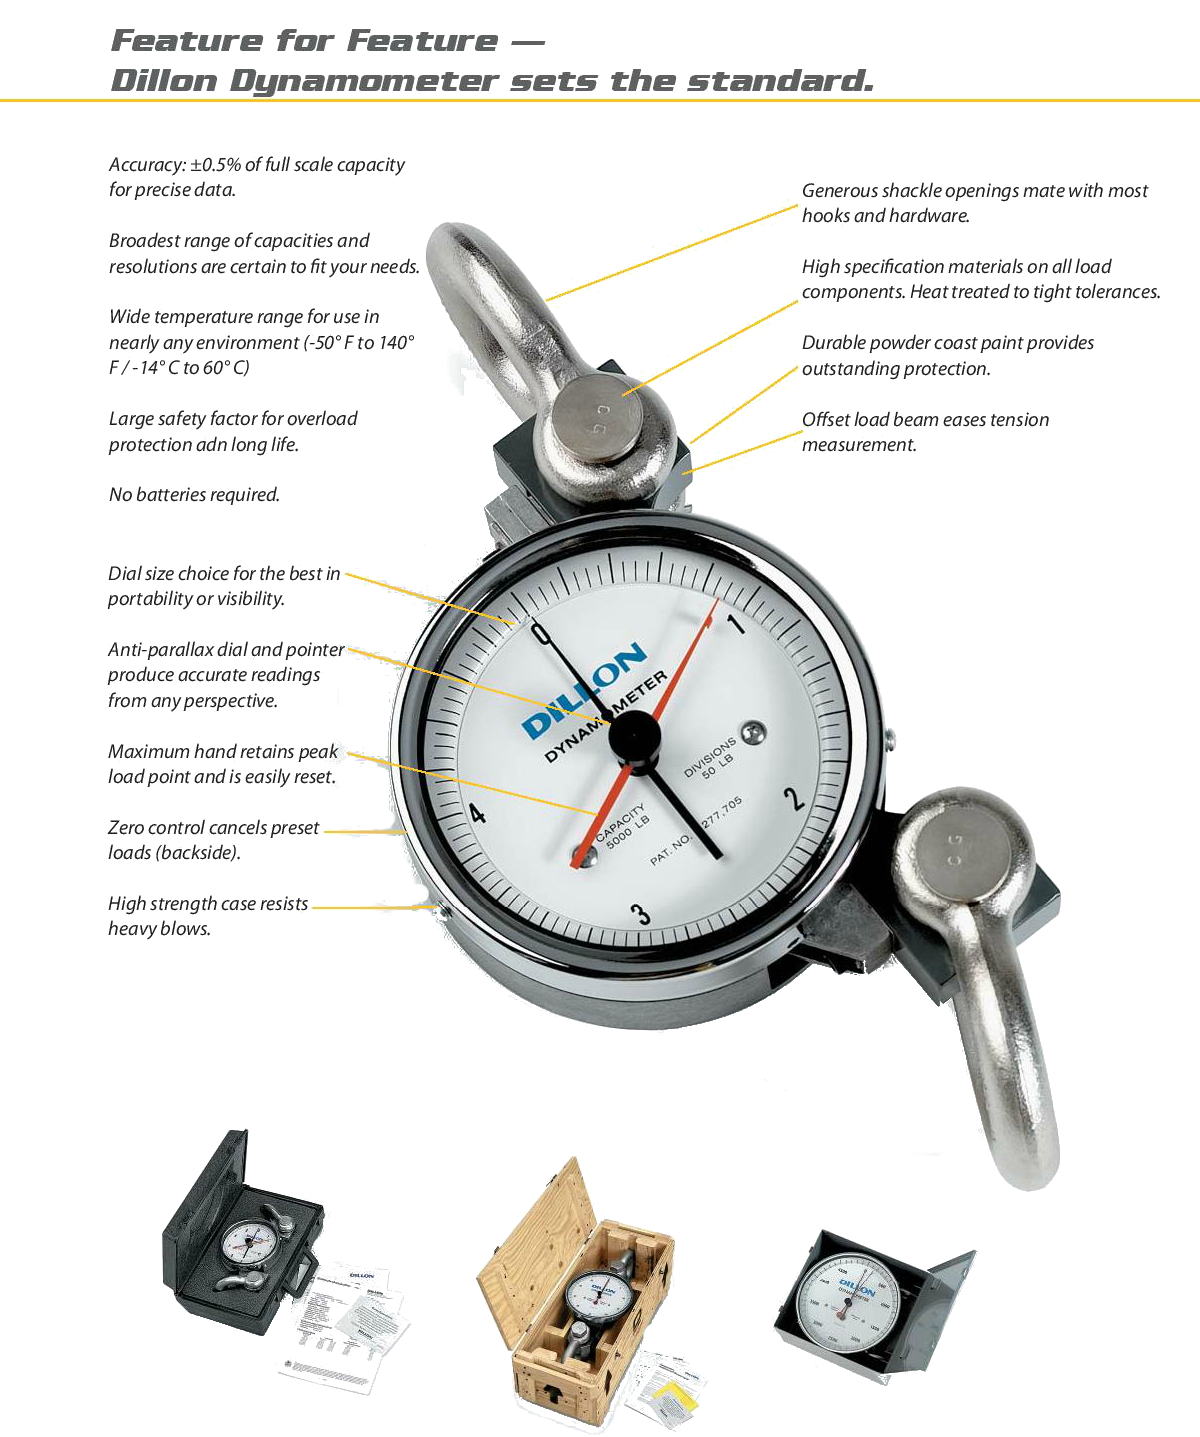 dillon ap dynamometer supplier in uae